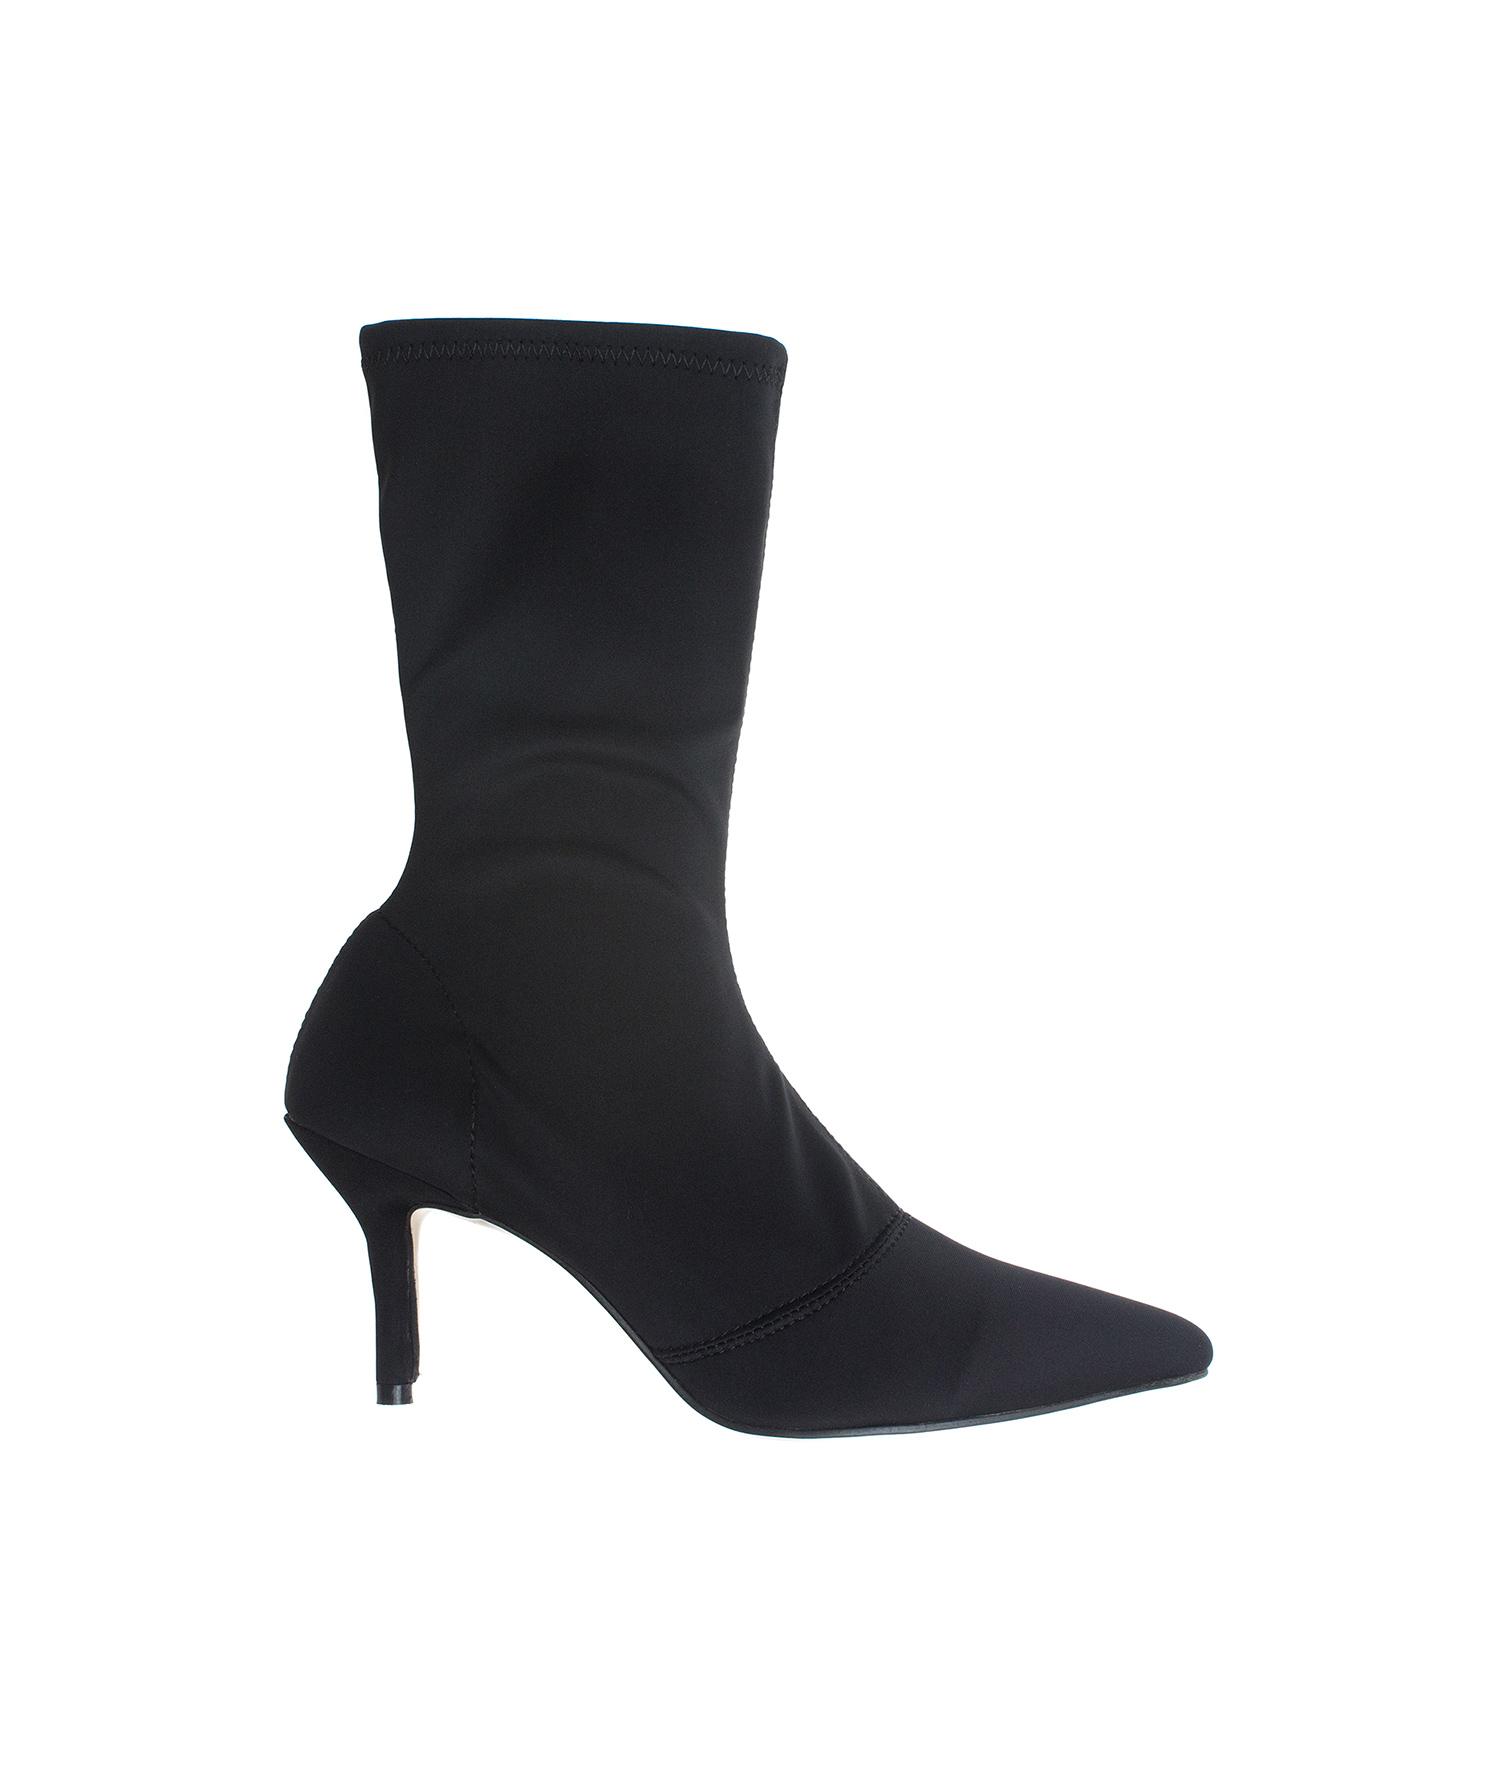 4d908e5165093 AnnaKastle Womens Pointy Toe Stretch Mid-Calf Boots Kitten Heel Booties  NeopreneBlack